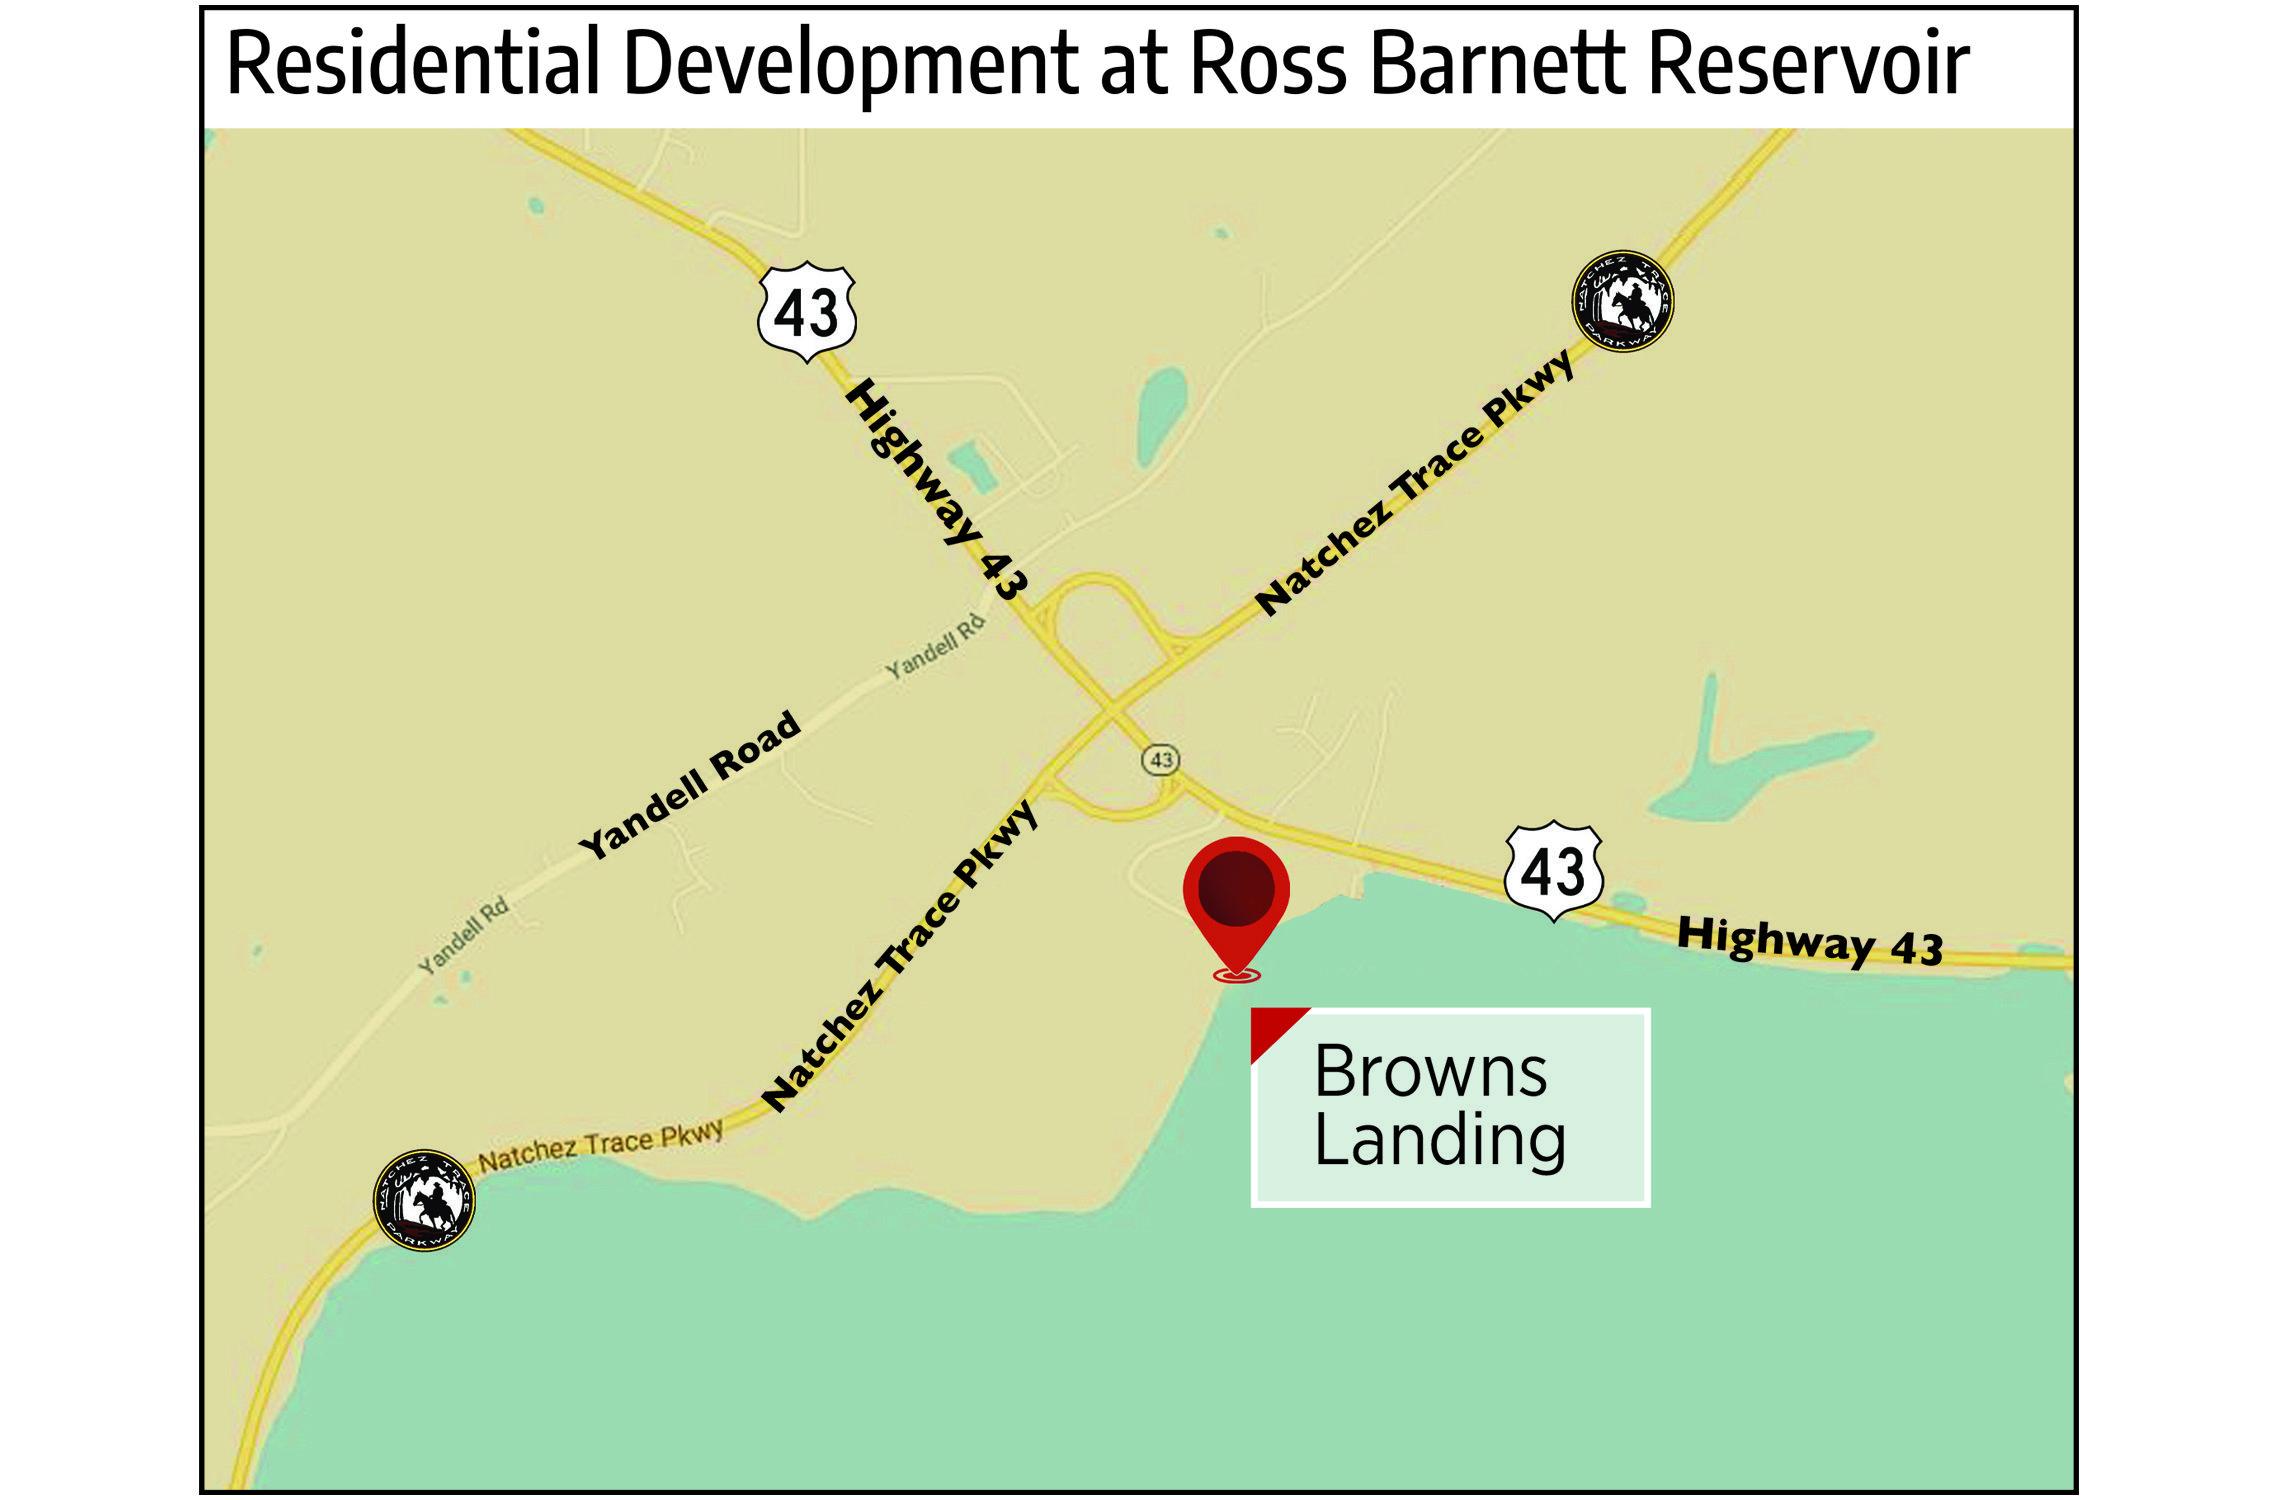 Residential Development Planned For Reservoir 180 Lots